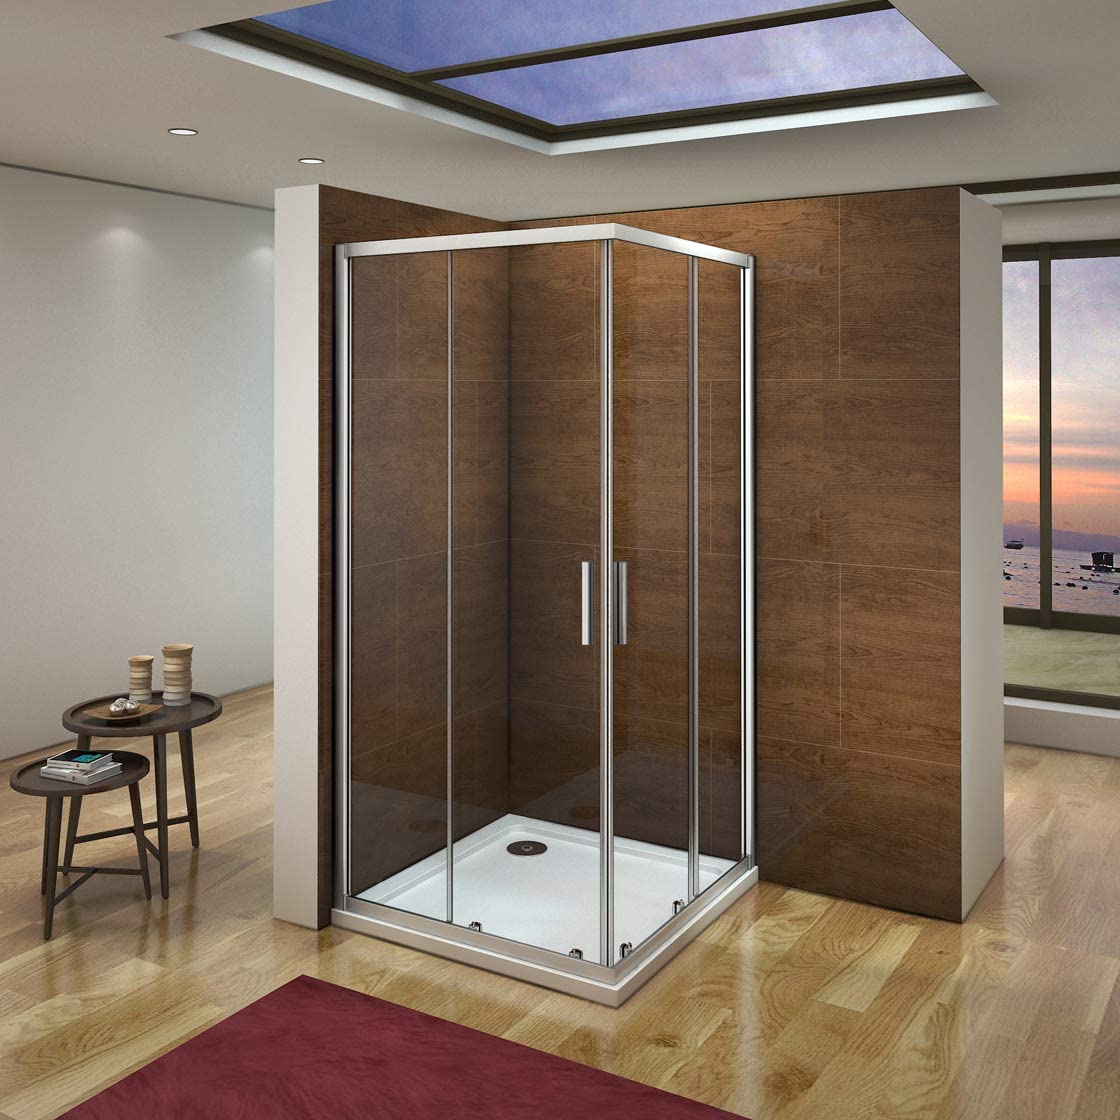 Mampara de Ducha Angular cabina de ducha mampara de ducha cuadrada Puerta Corredera Cristal 5 MM perfilería gris mate 90x80x185cm